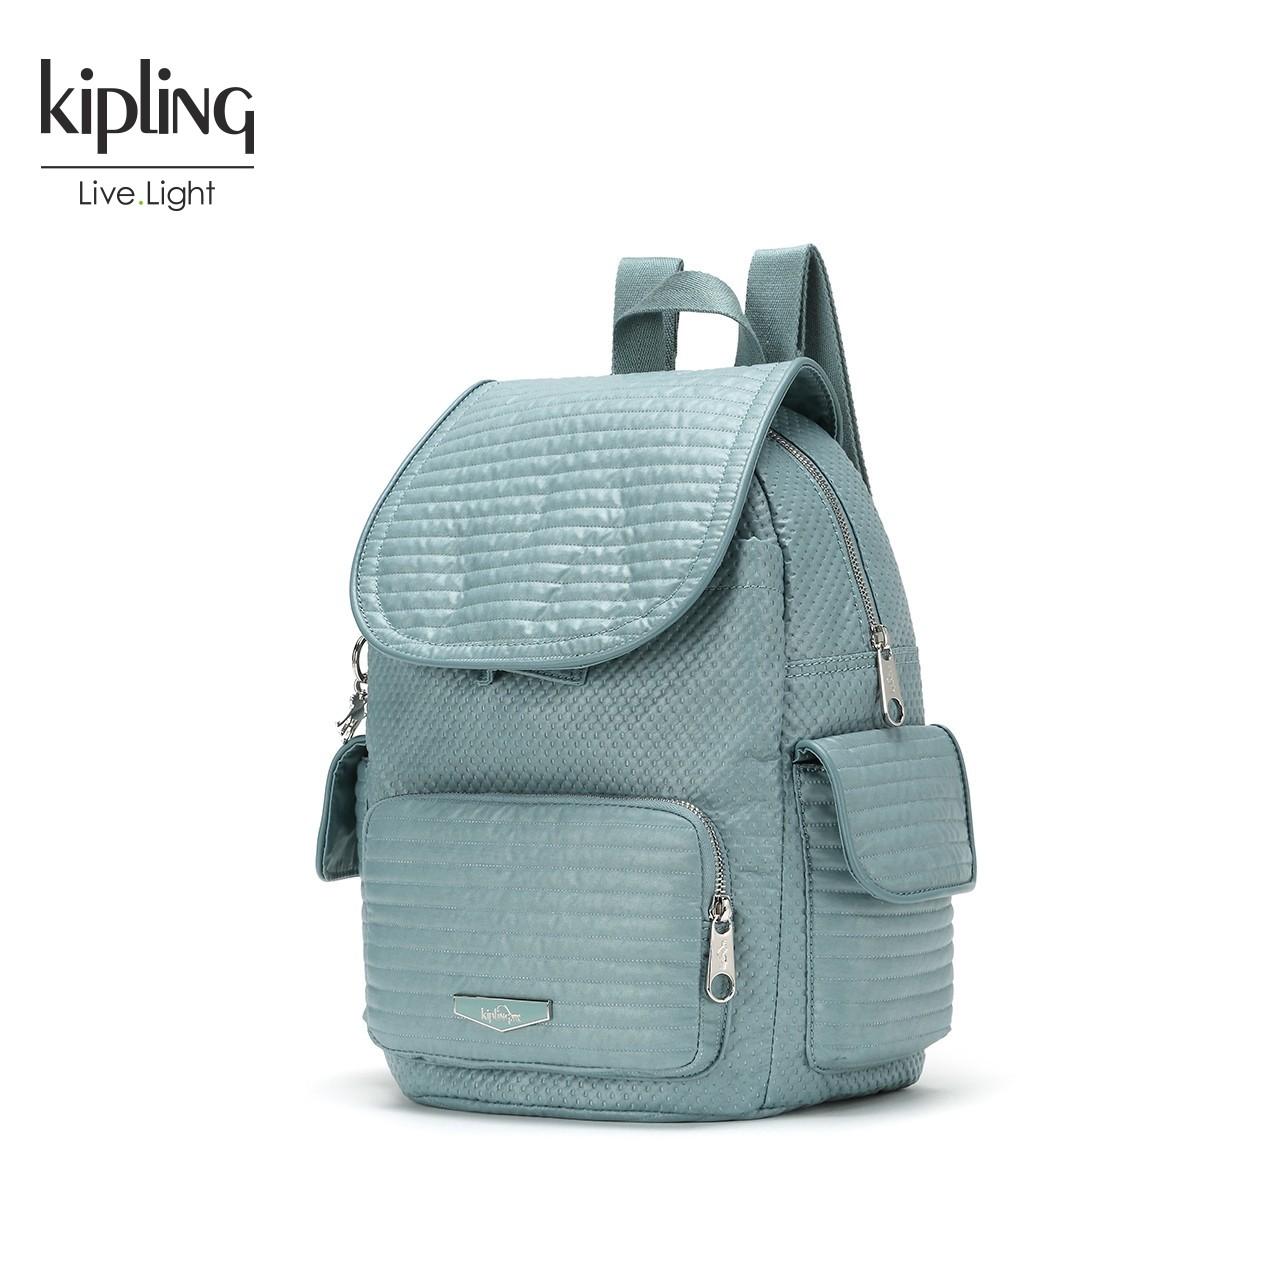 Kipling凯浦林女包2018新款K18731双肩包绗缝休闲百搭女士背包